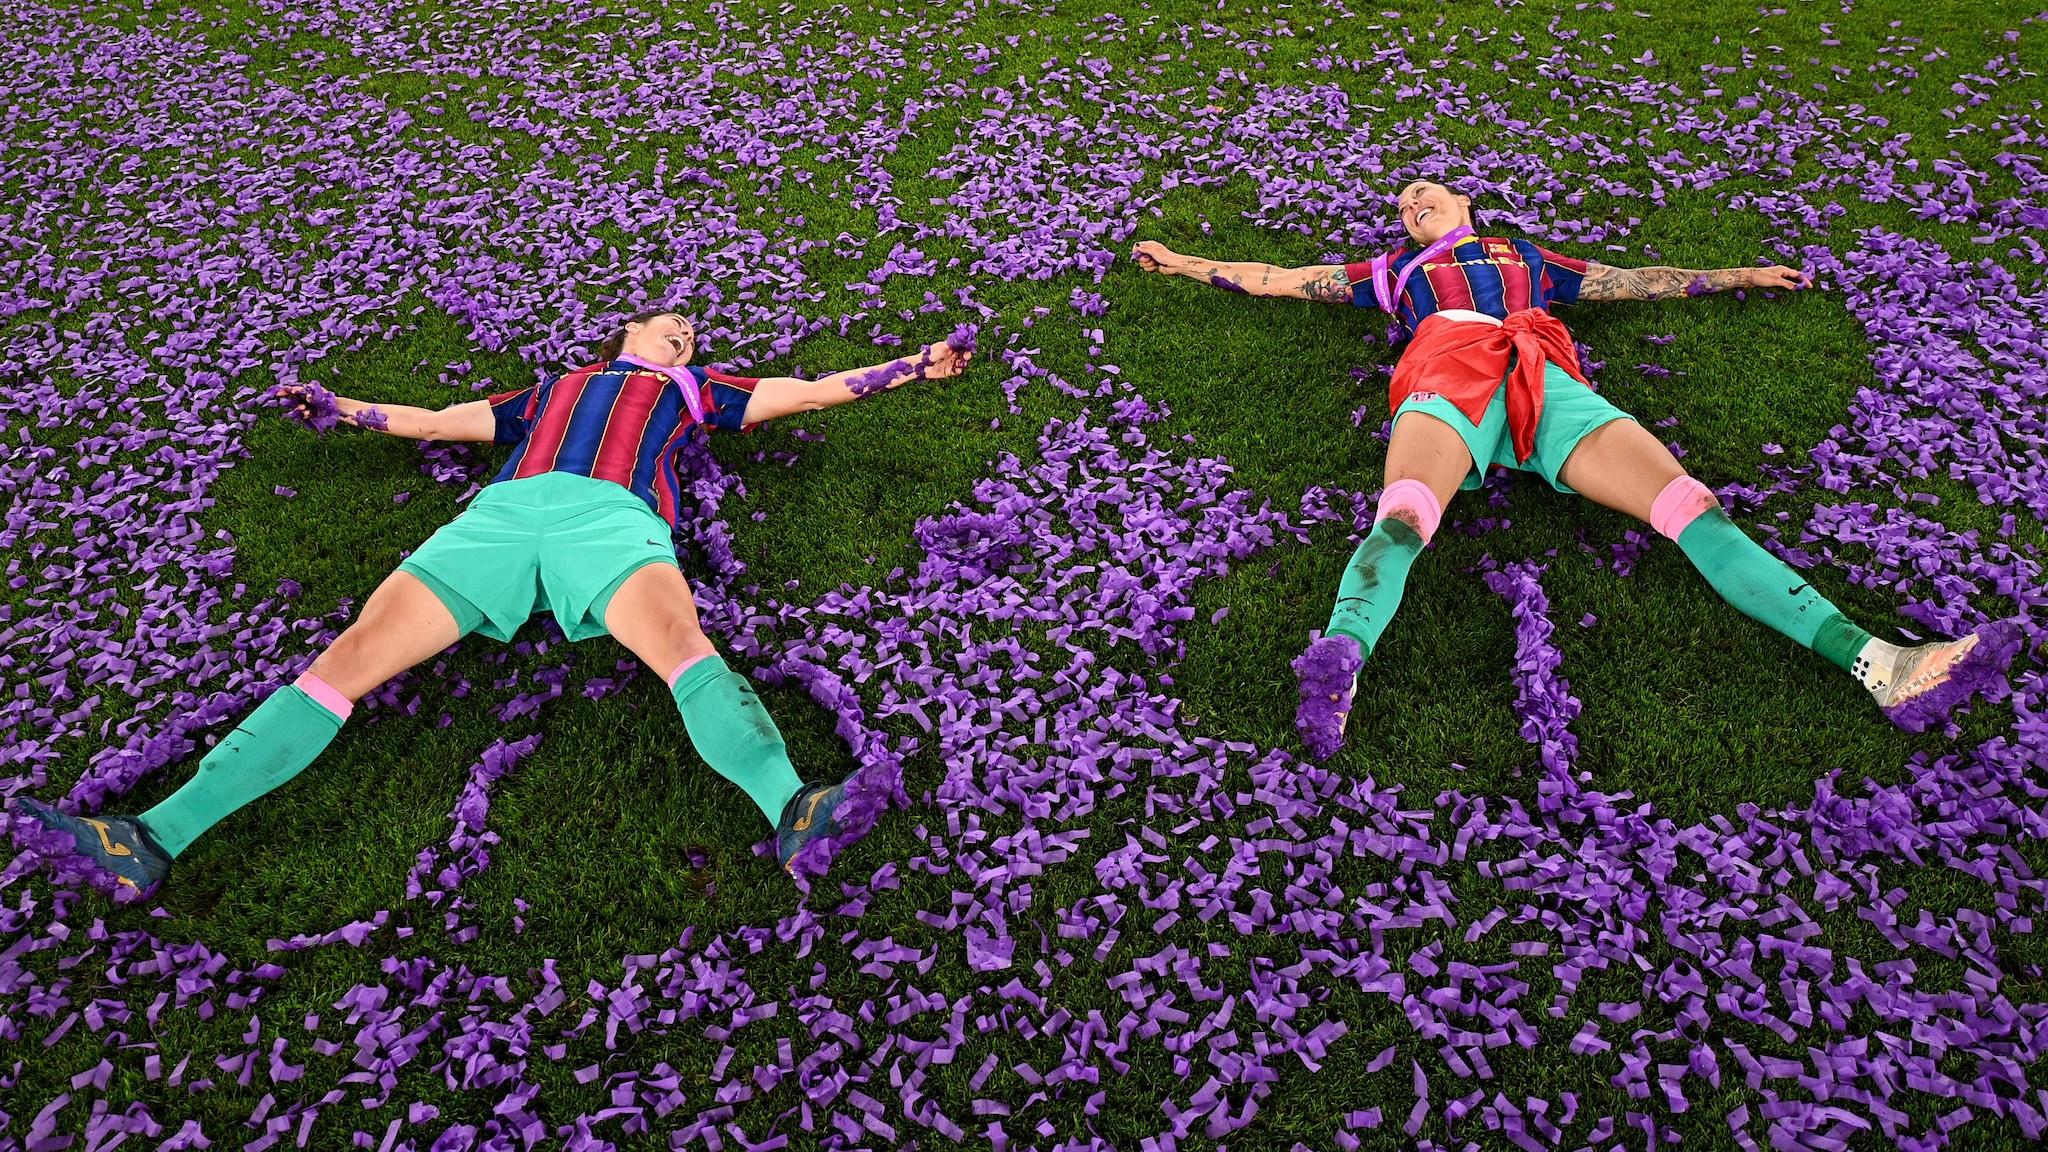 Women's Champions League entries confirmed